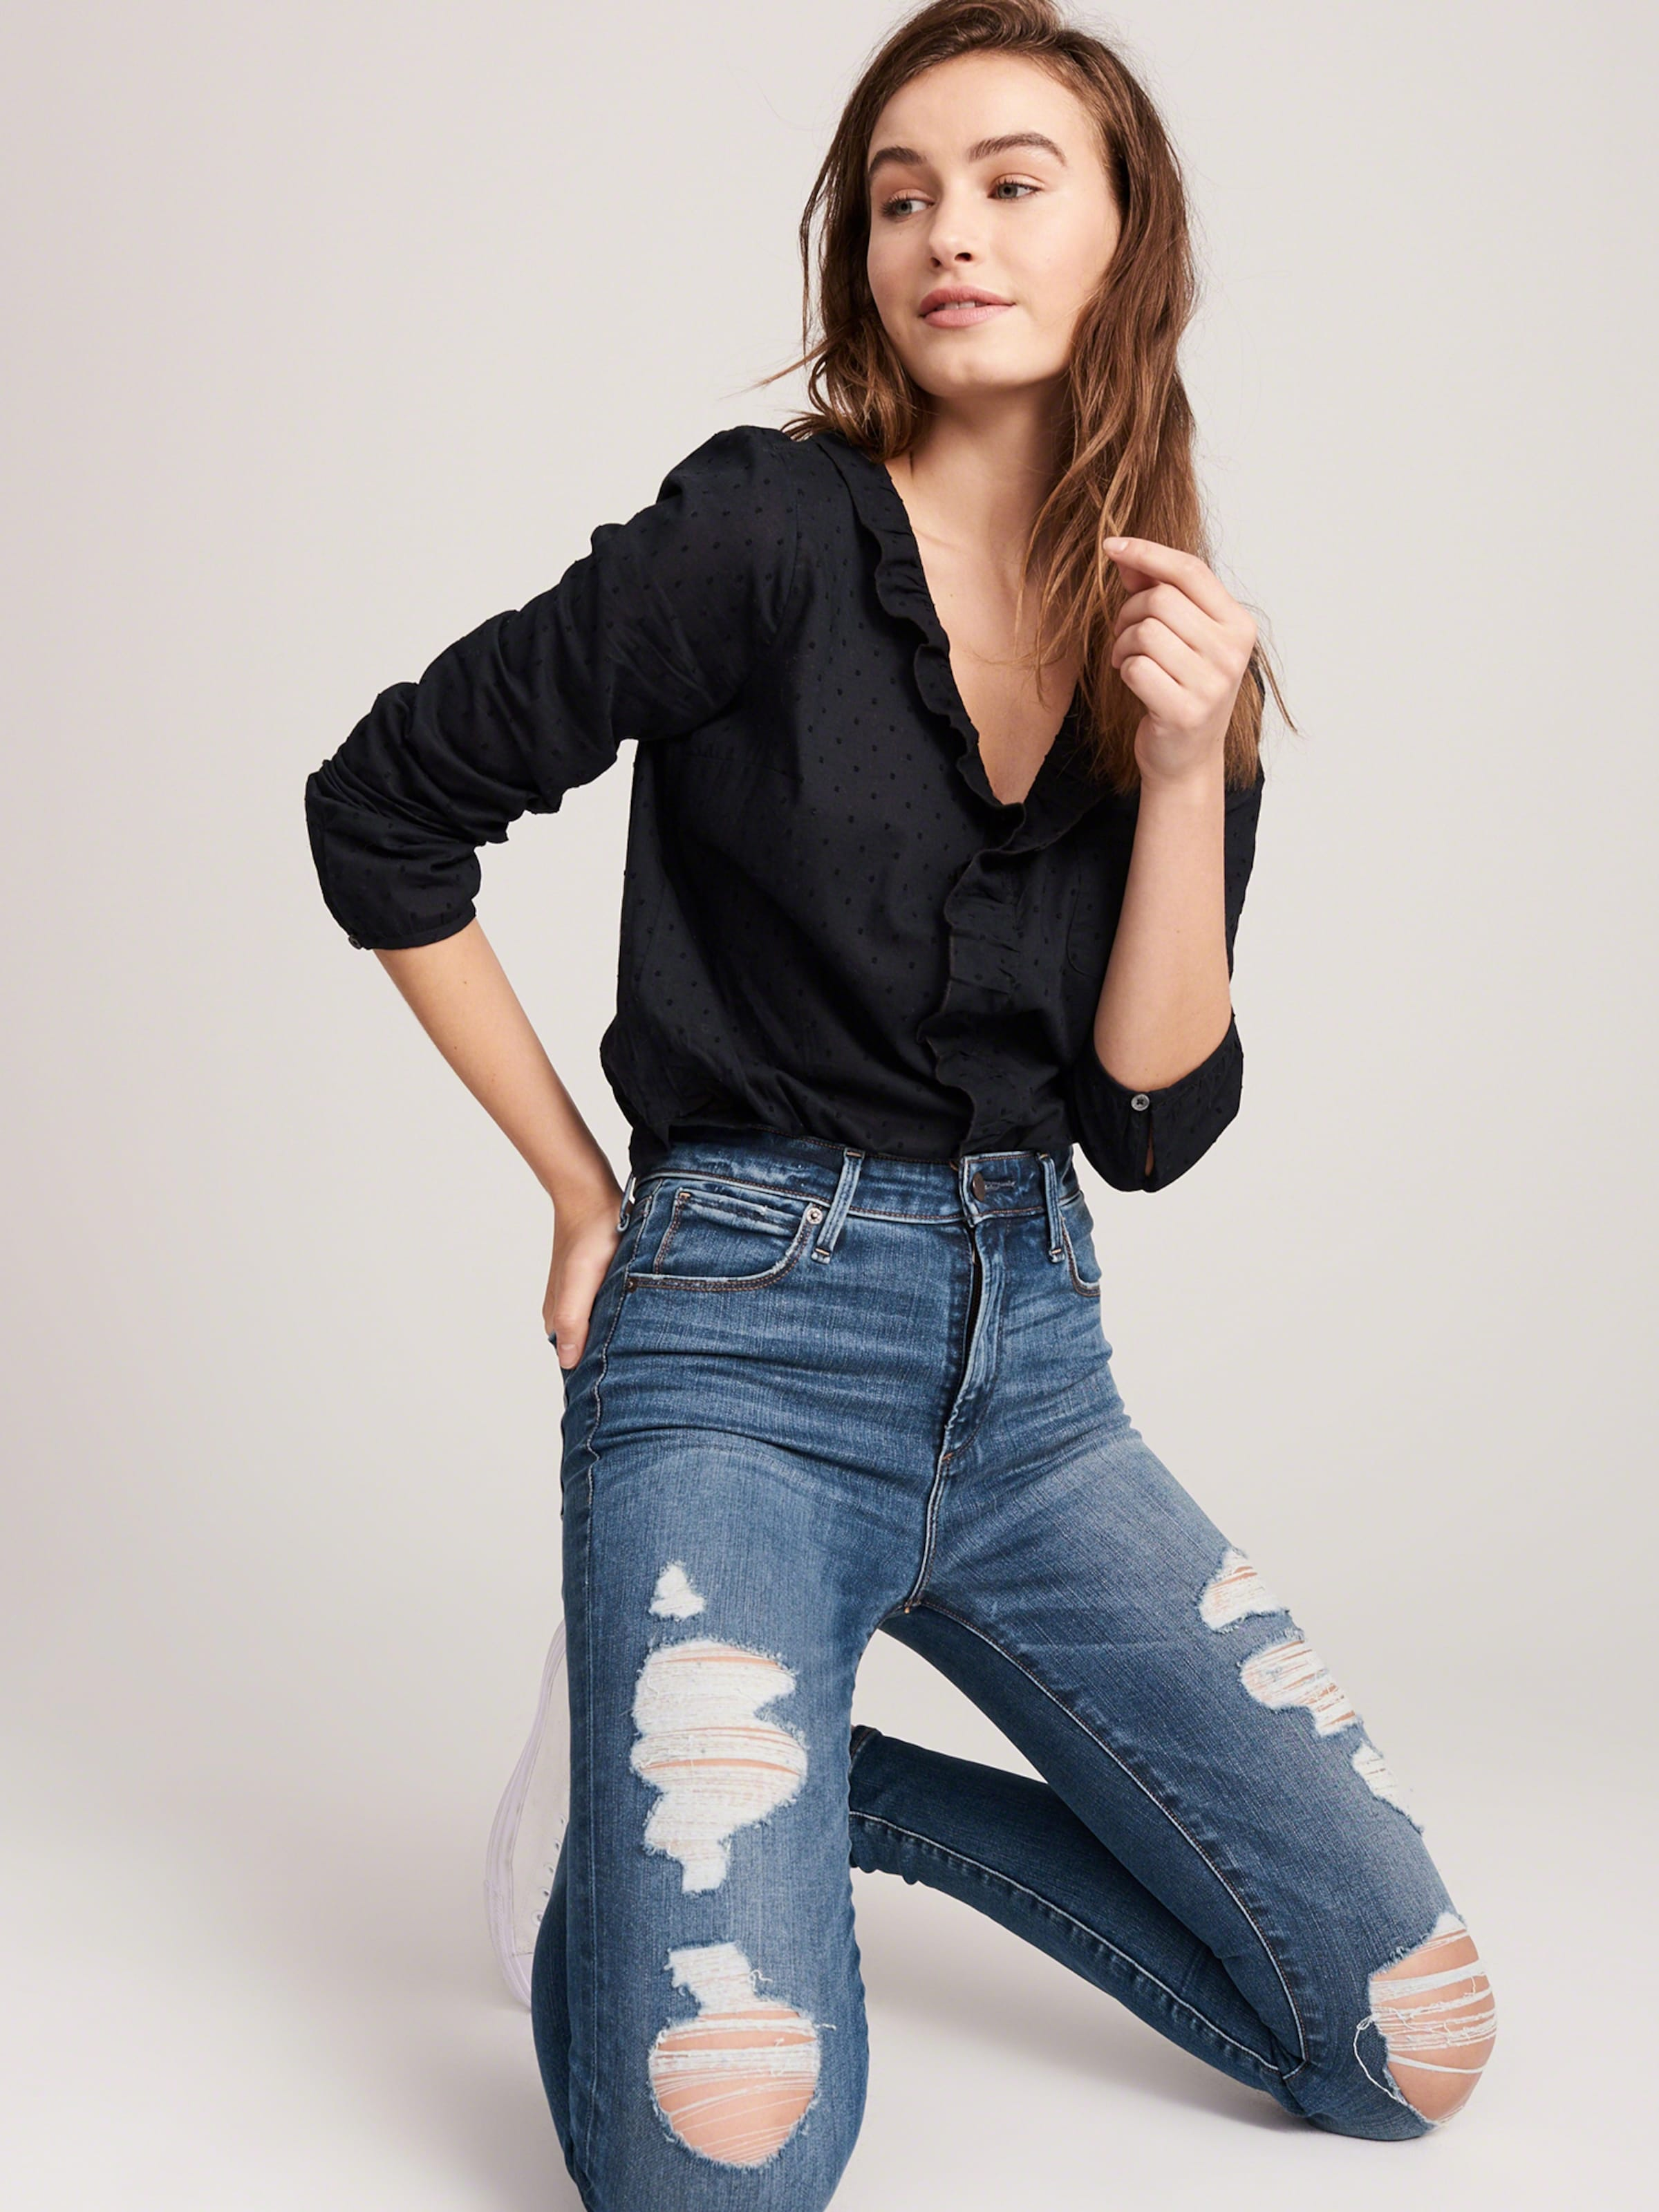 Abercrombieamp; 'dest Fitch Simone' Jeans In Blue Denim MVjLSzUpqG